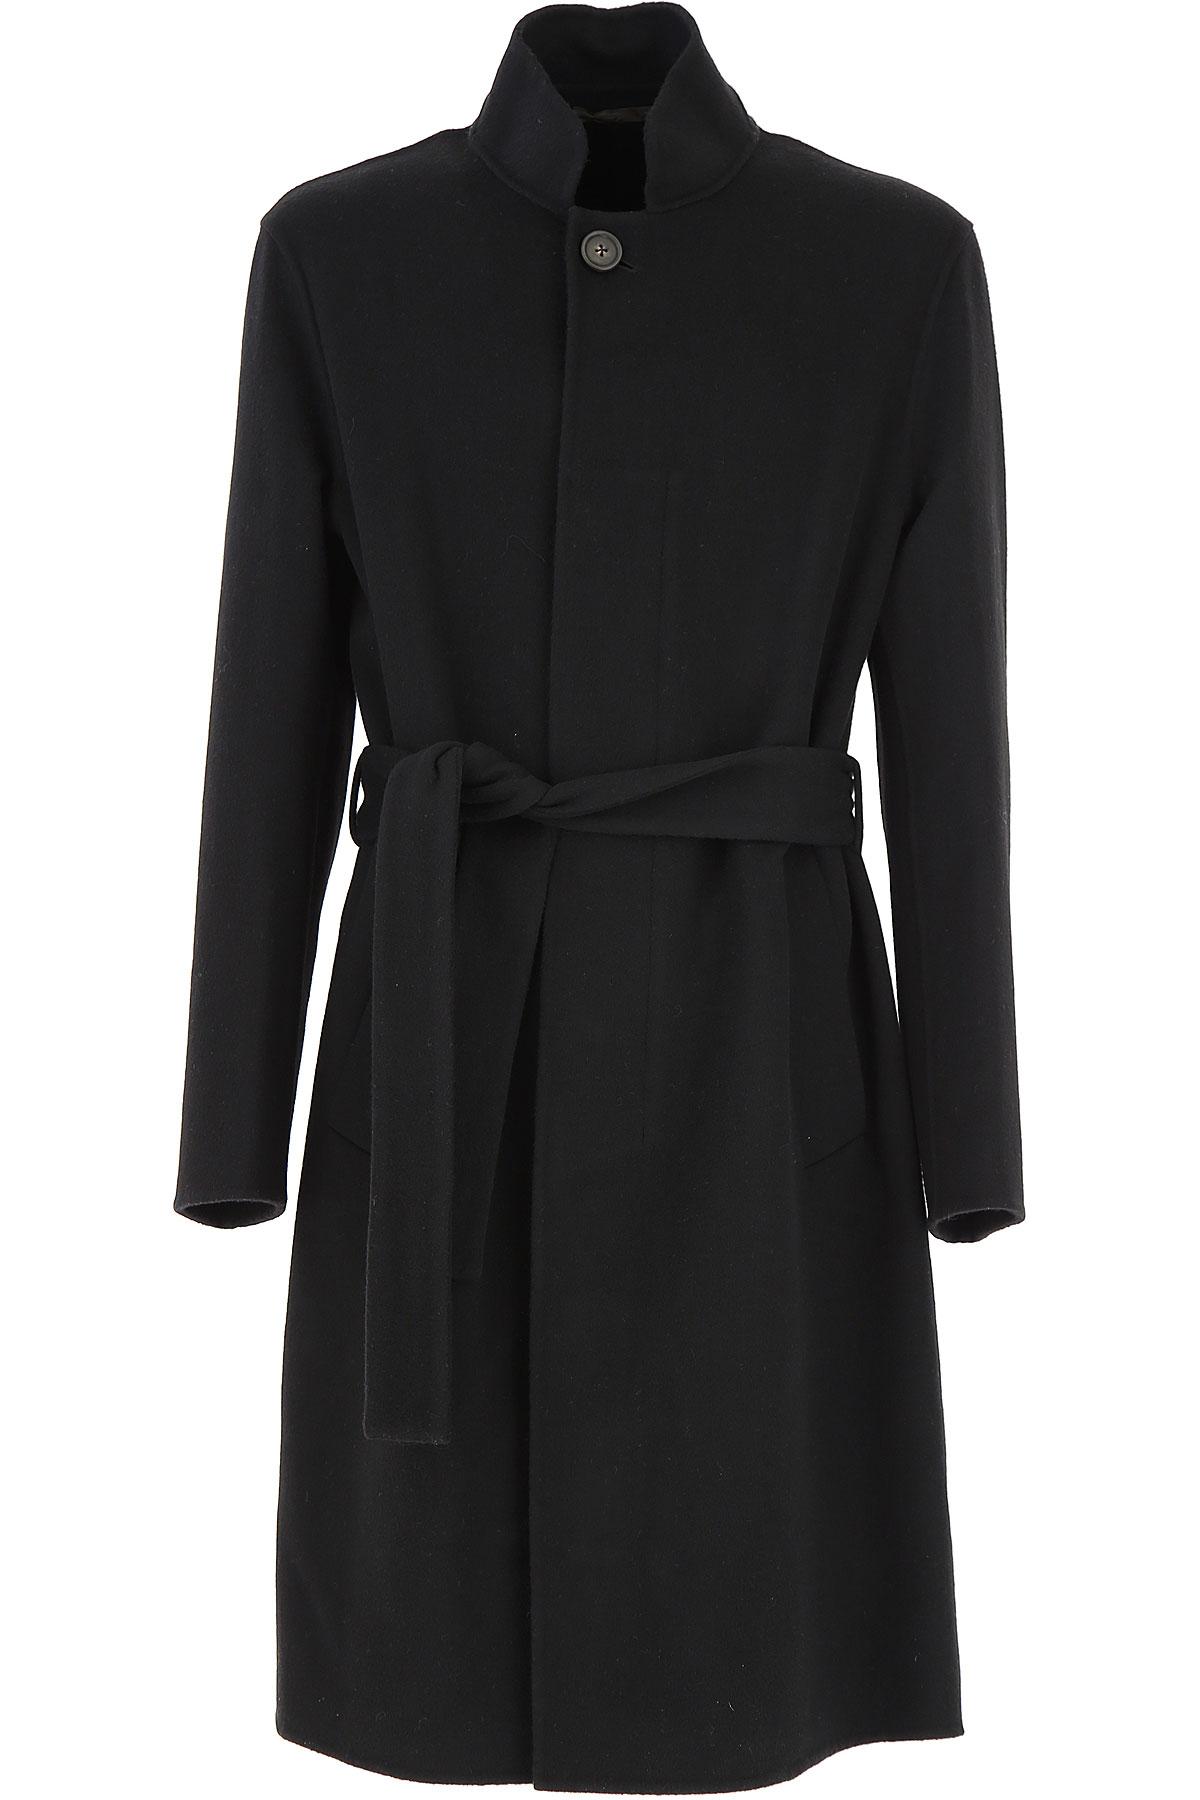 Image of Acne Studios Men\'s Coat, Black, Wool, 2017, L S XL